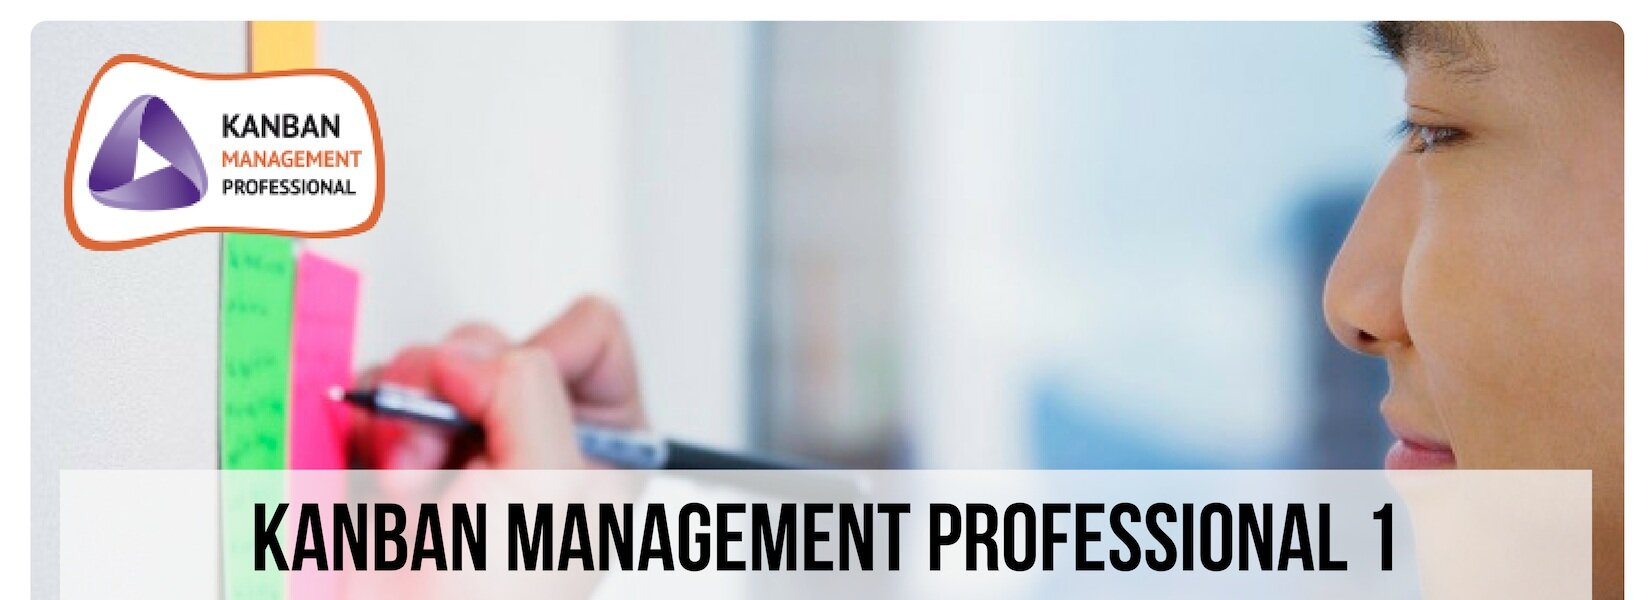 Kanban Management Professional 1.png